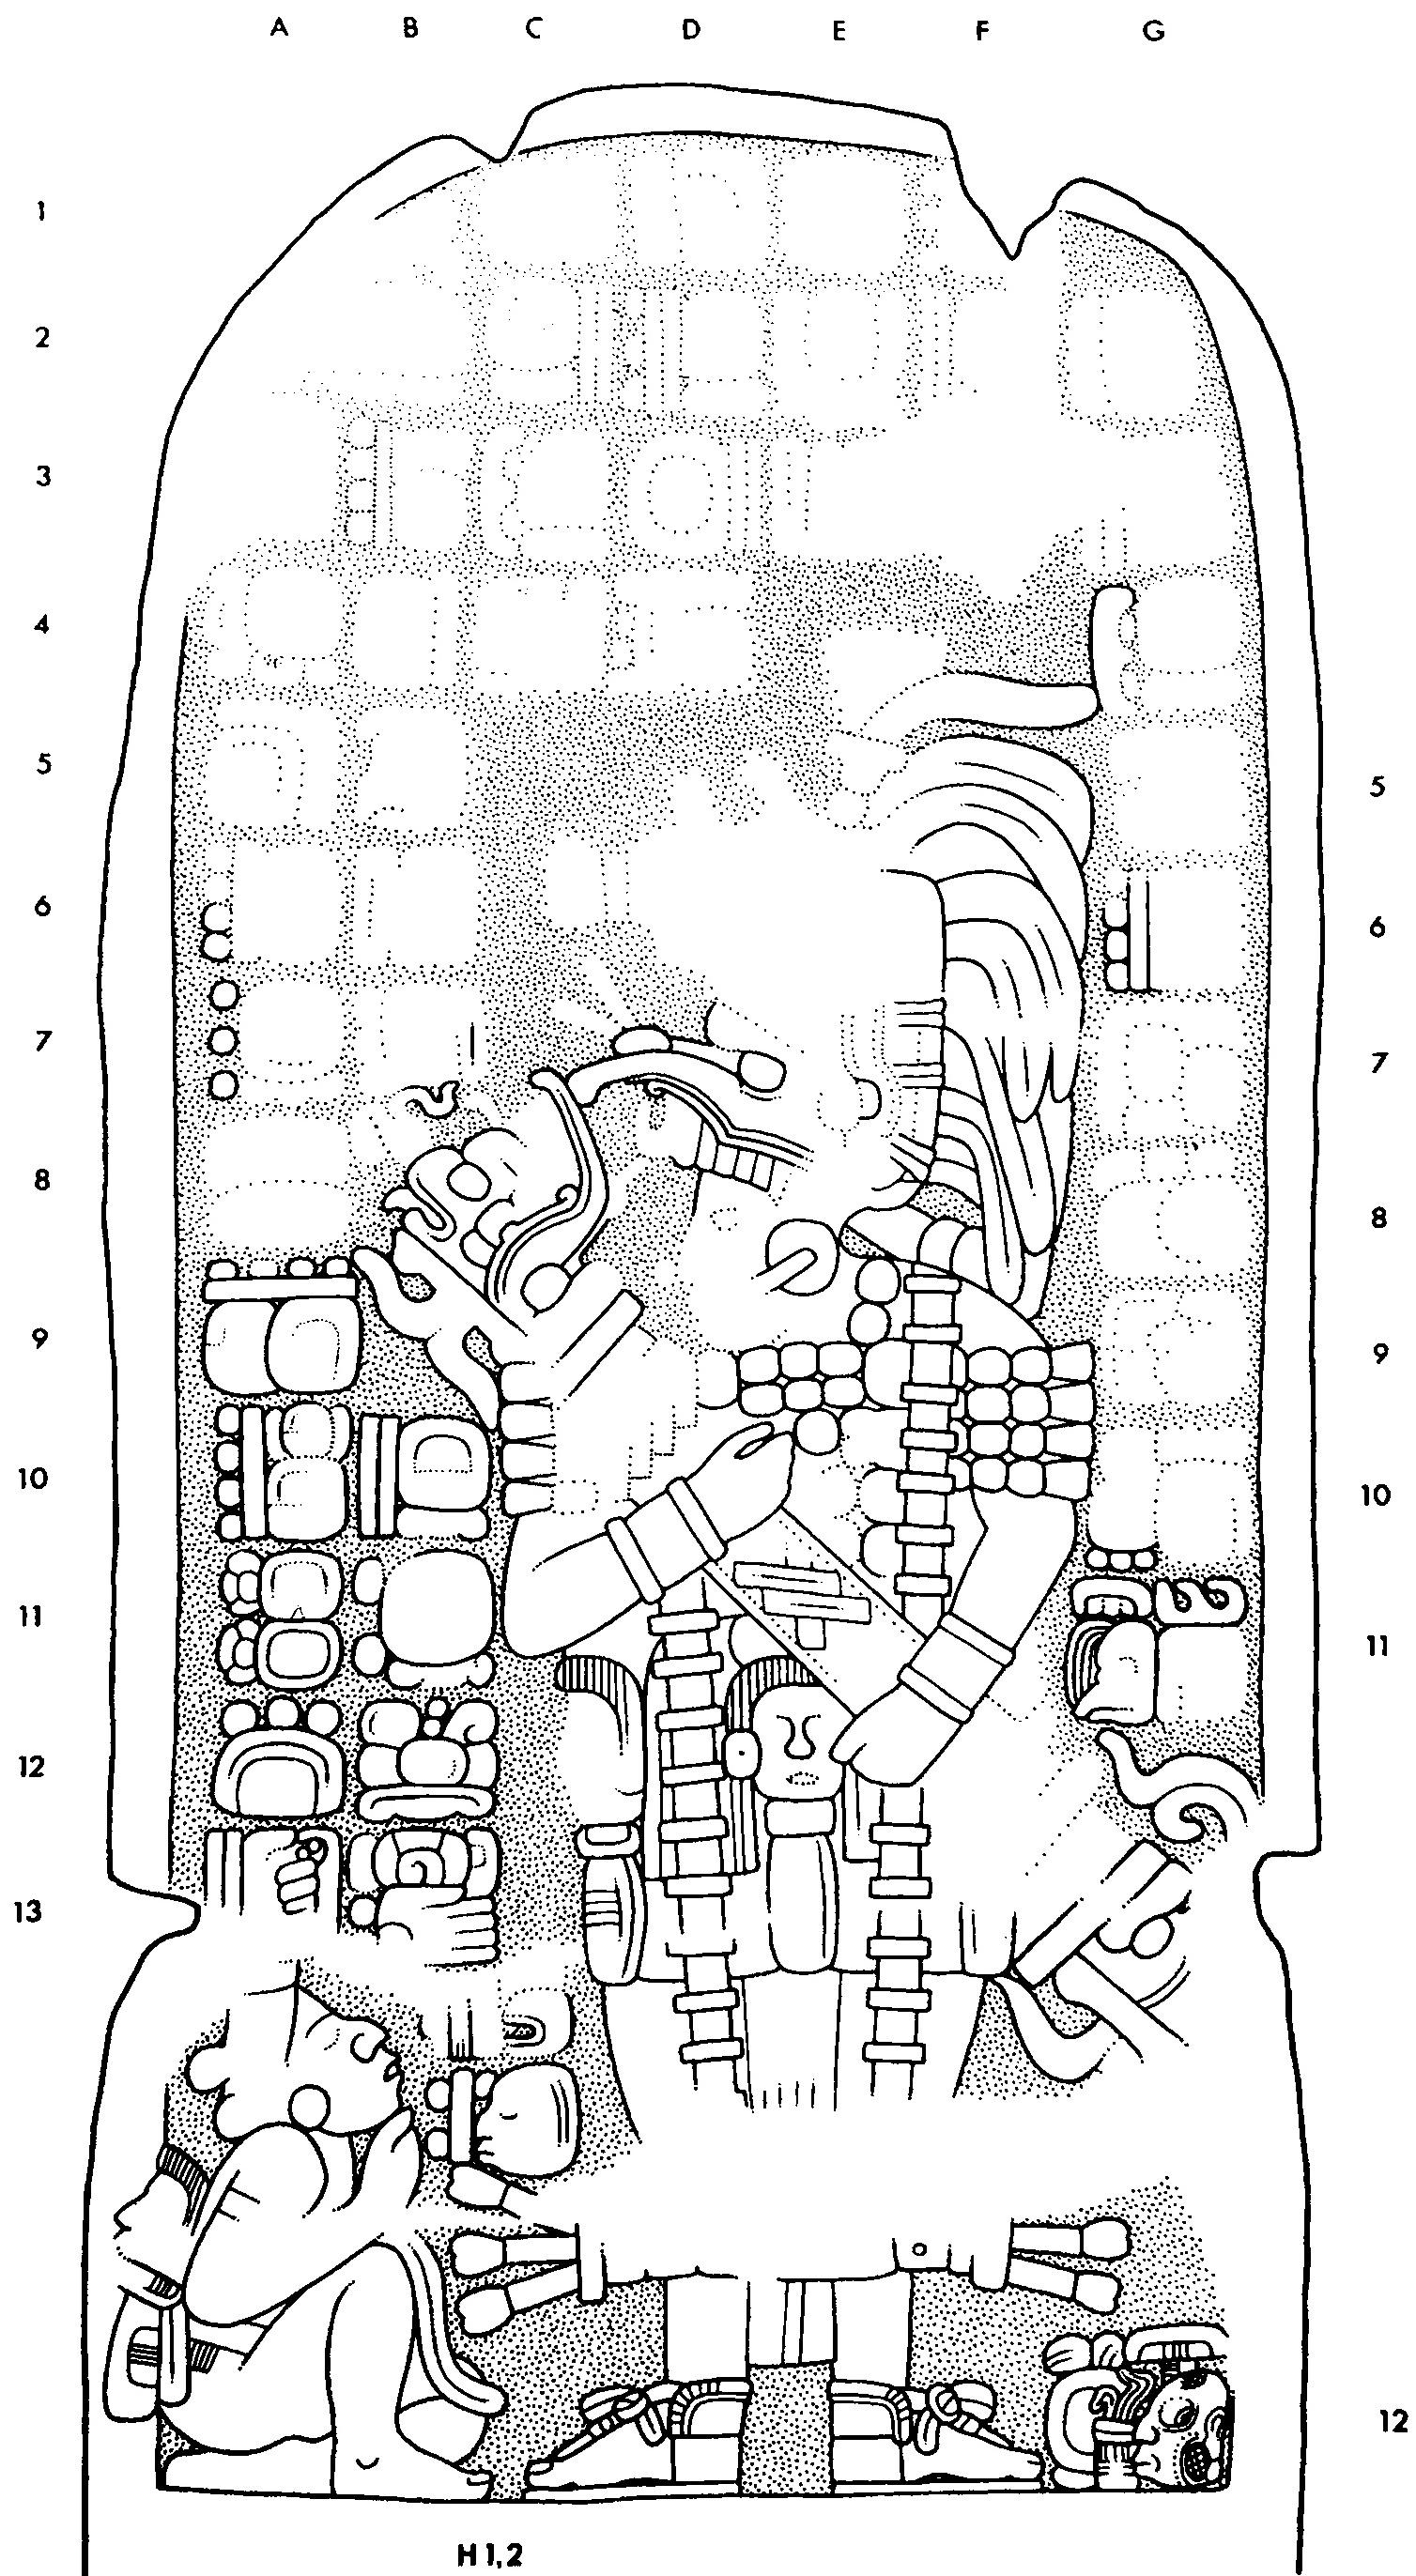 Fig.1 COB St.1 Whole